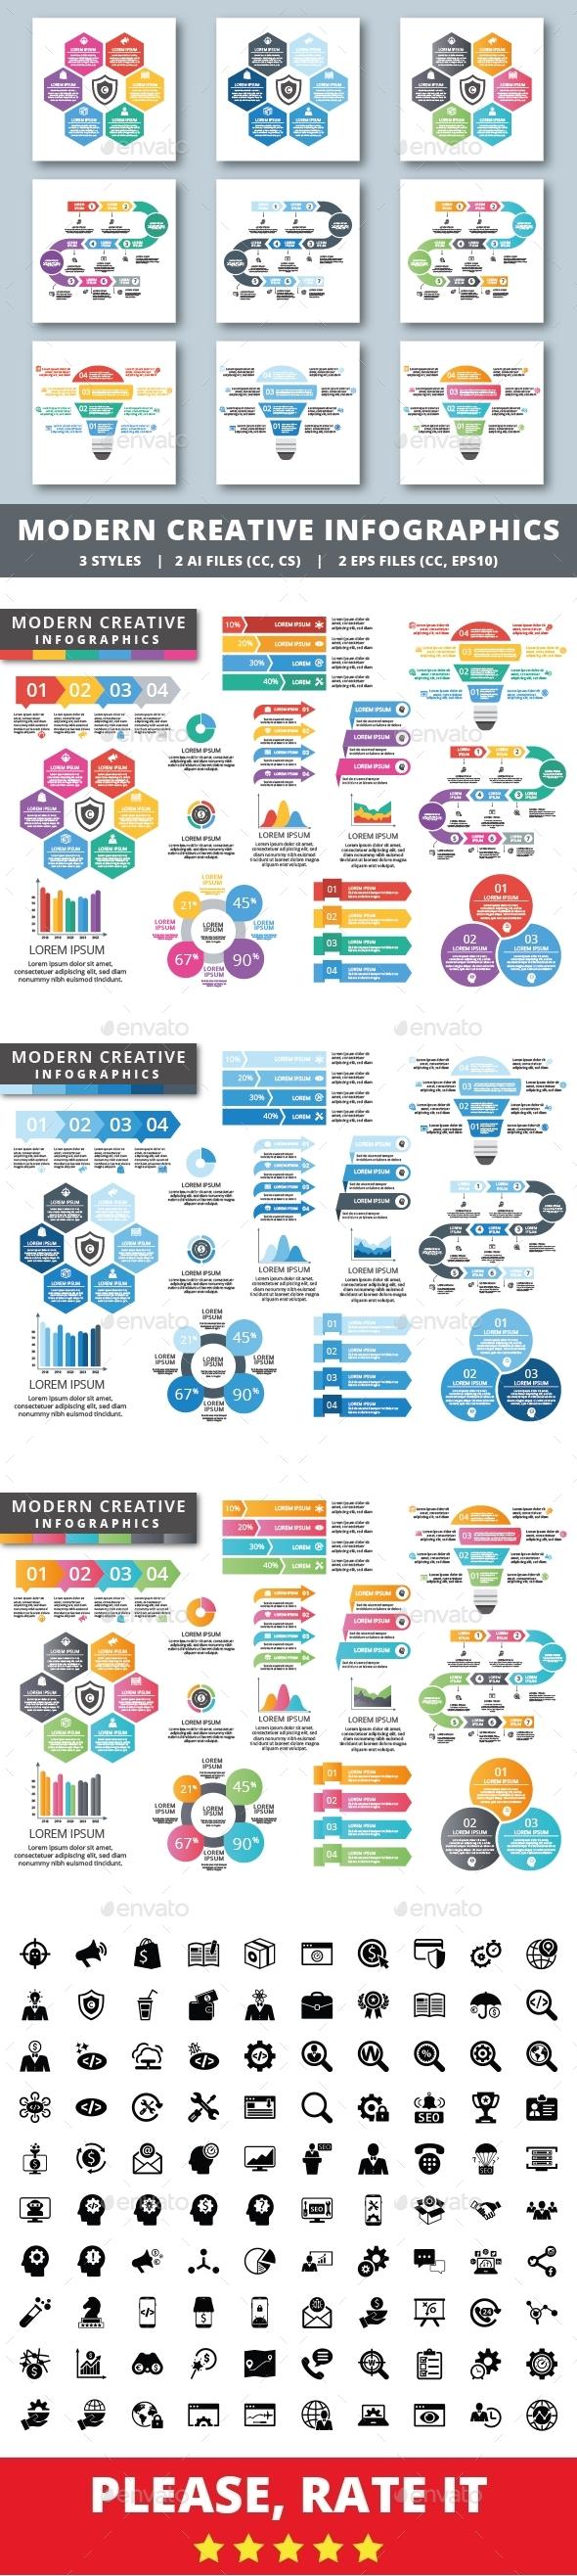 Modern Creative Infographics - Infographics